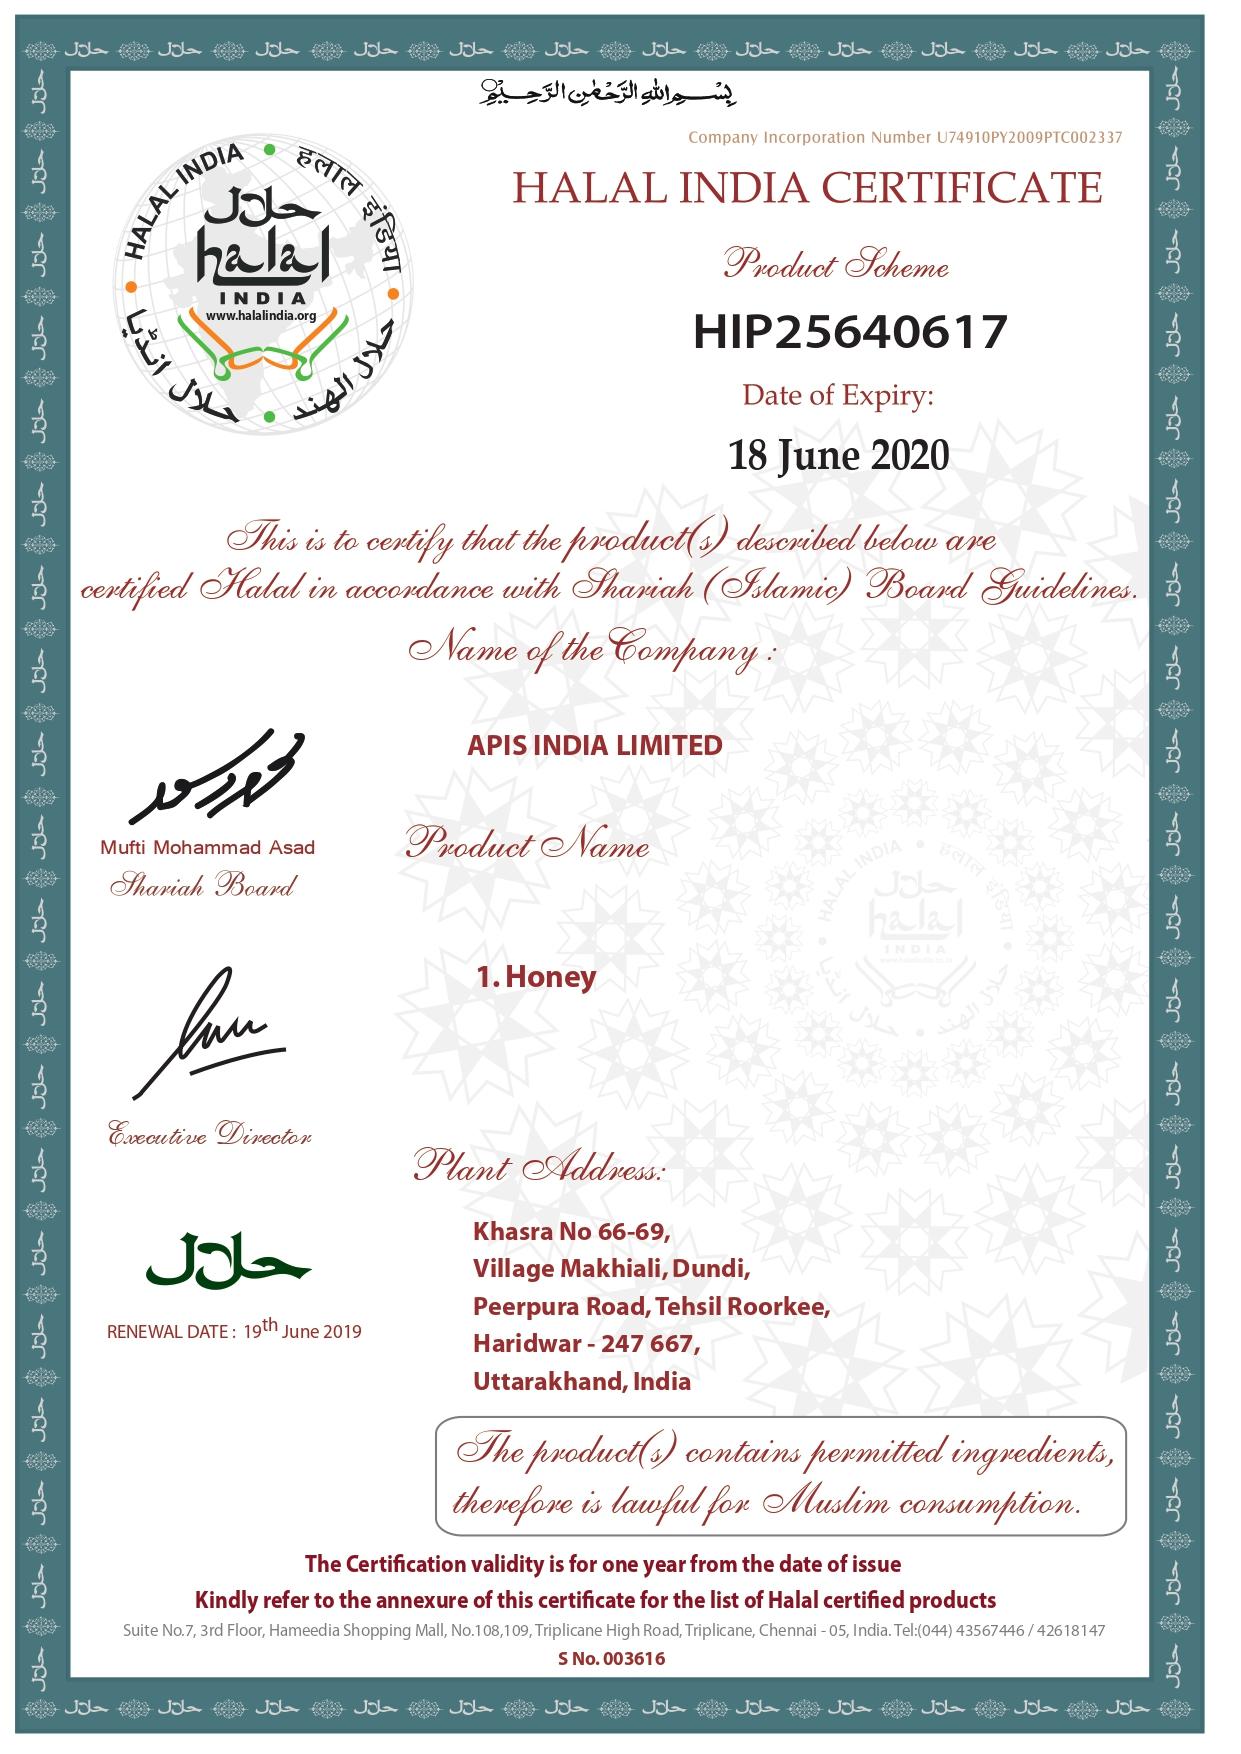 Top Honey Manufacturer Company In India | Apis India